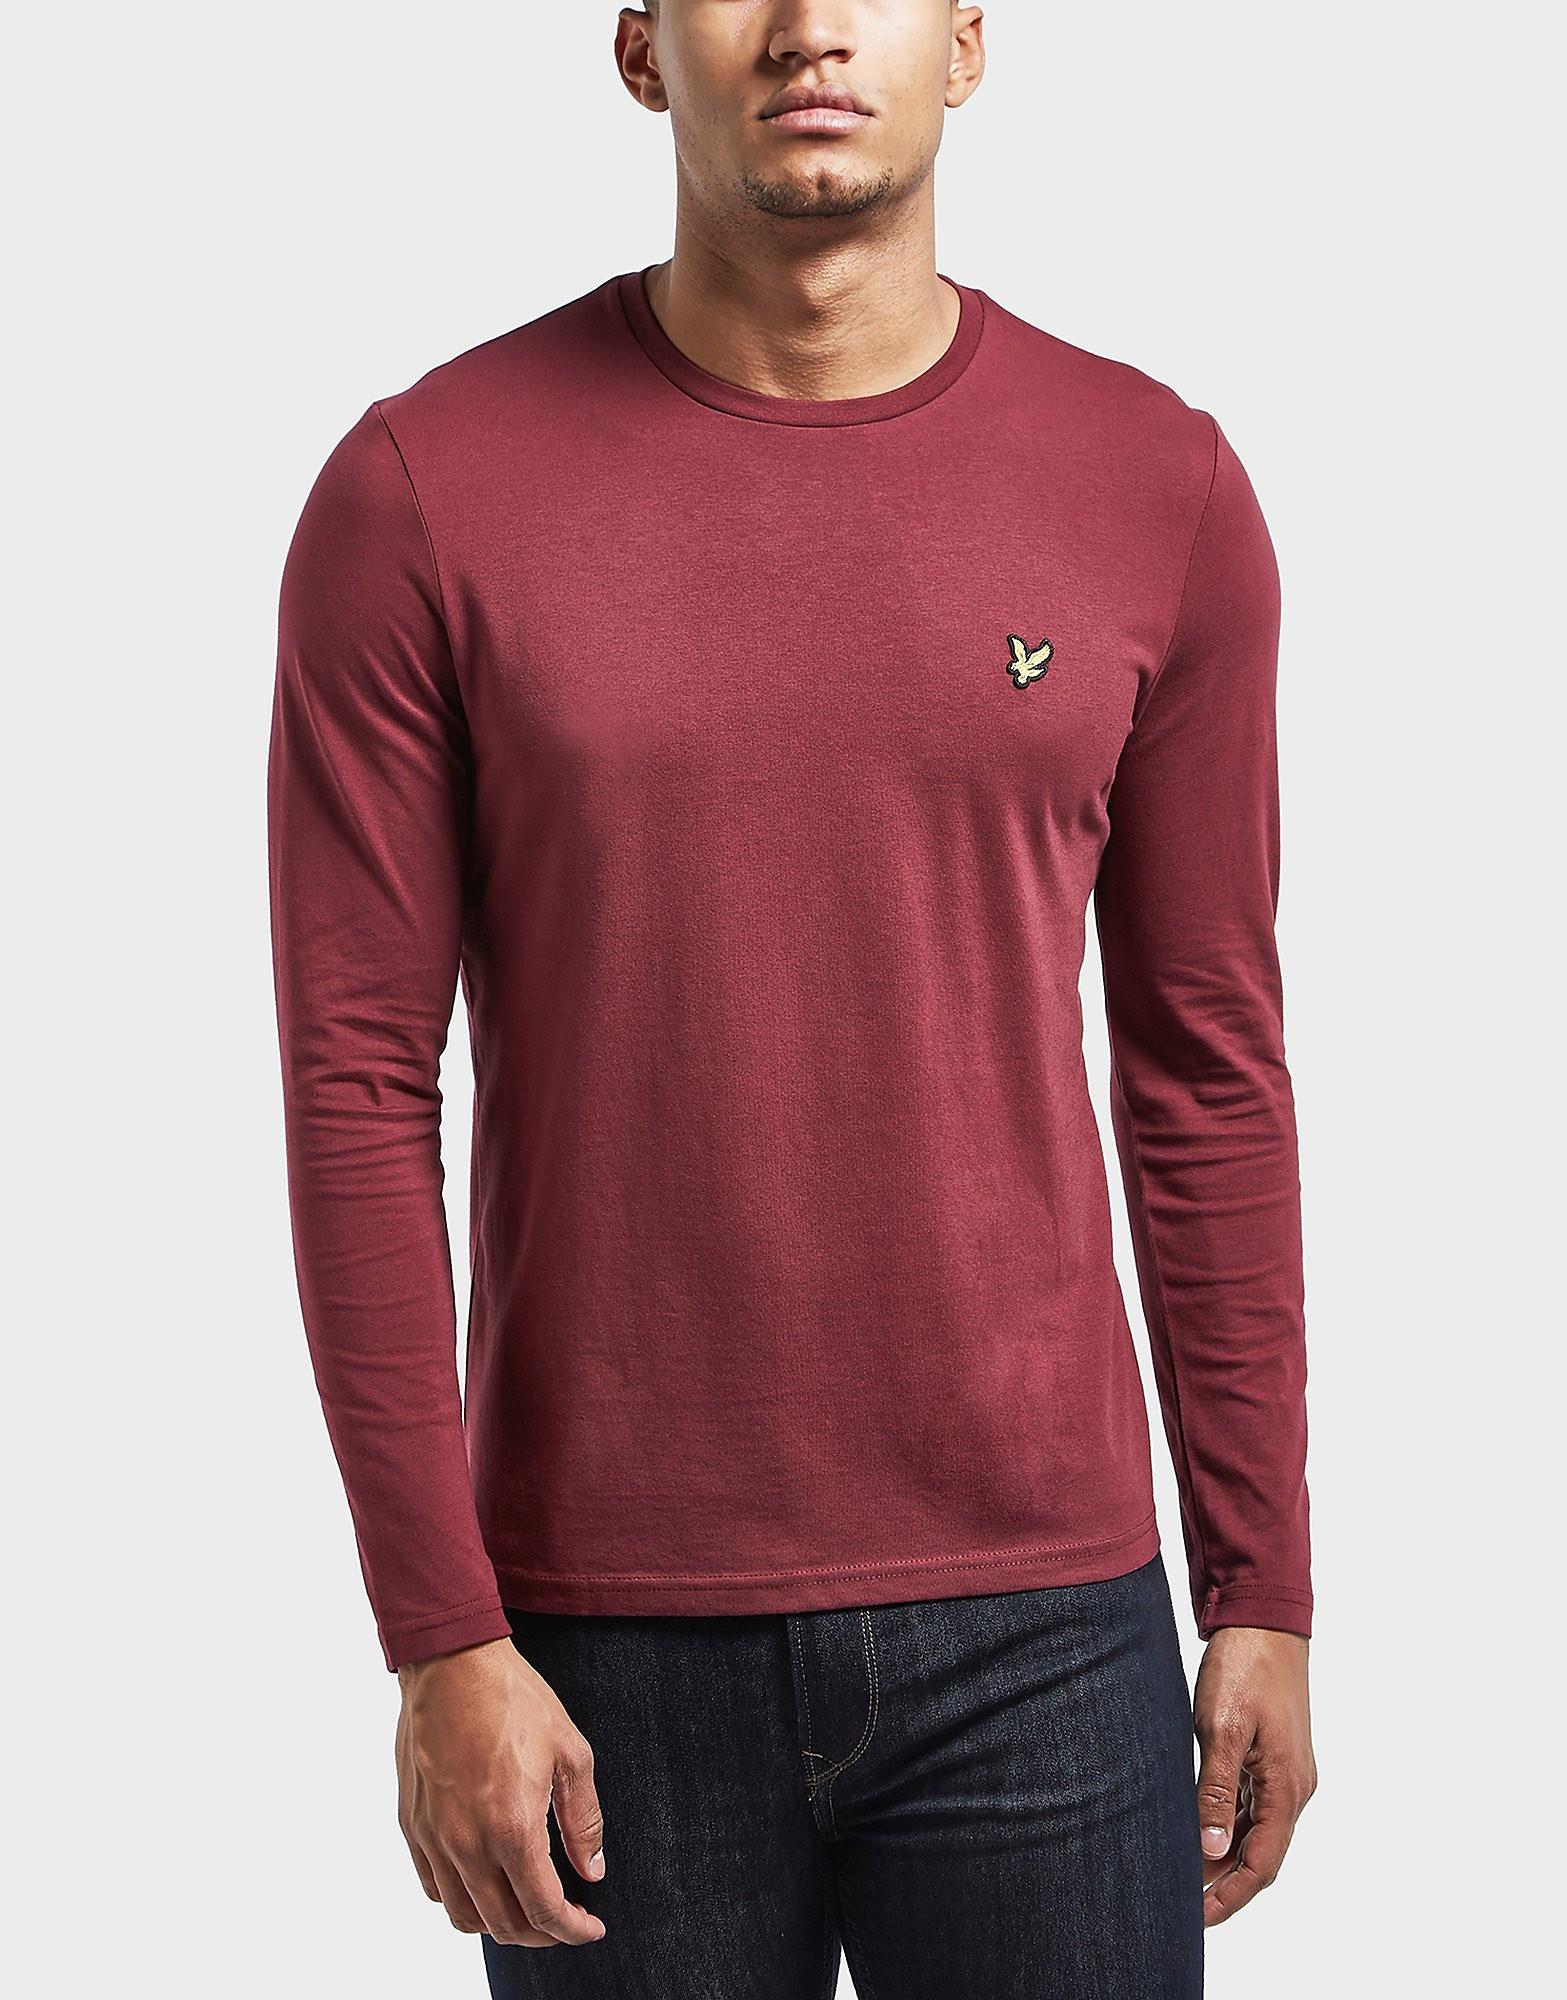 Lyle & Scott Long Sleeve Crew Neck T-Shirt